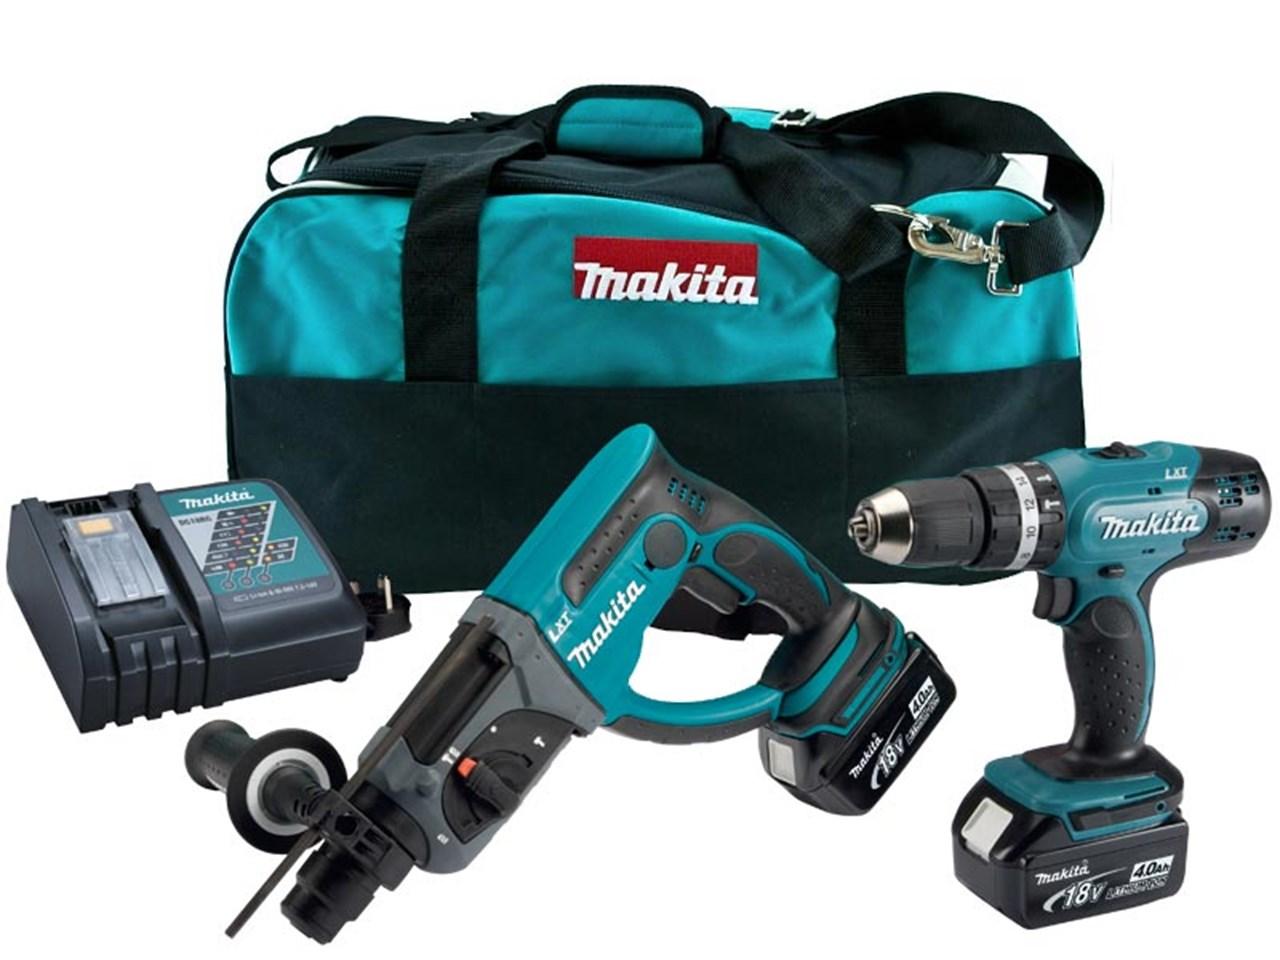 Makita 18V SDS 2-Mode Hammer Drill & Combi Drill - DLX2025M - 4.0Ah Pack